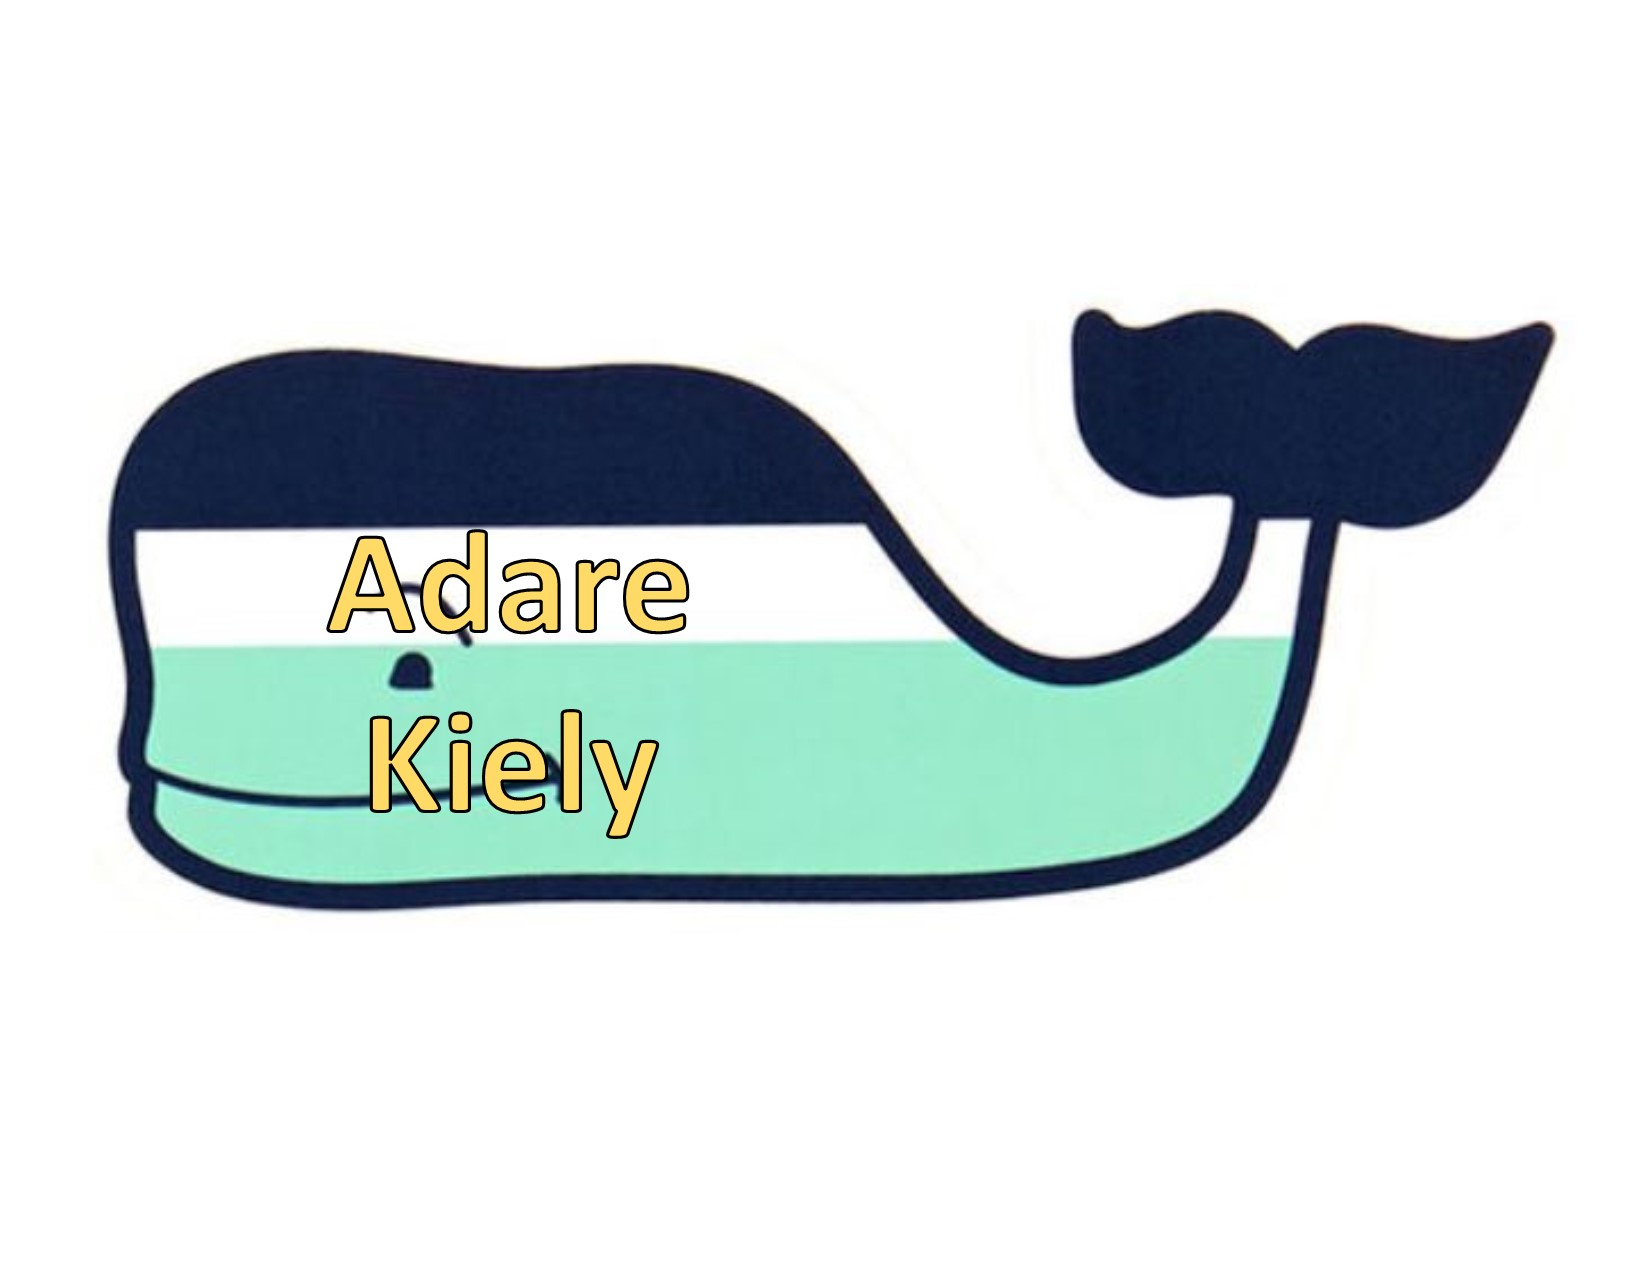 Kiely, Adare.jpg